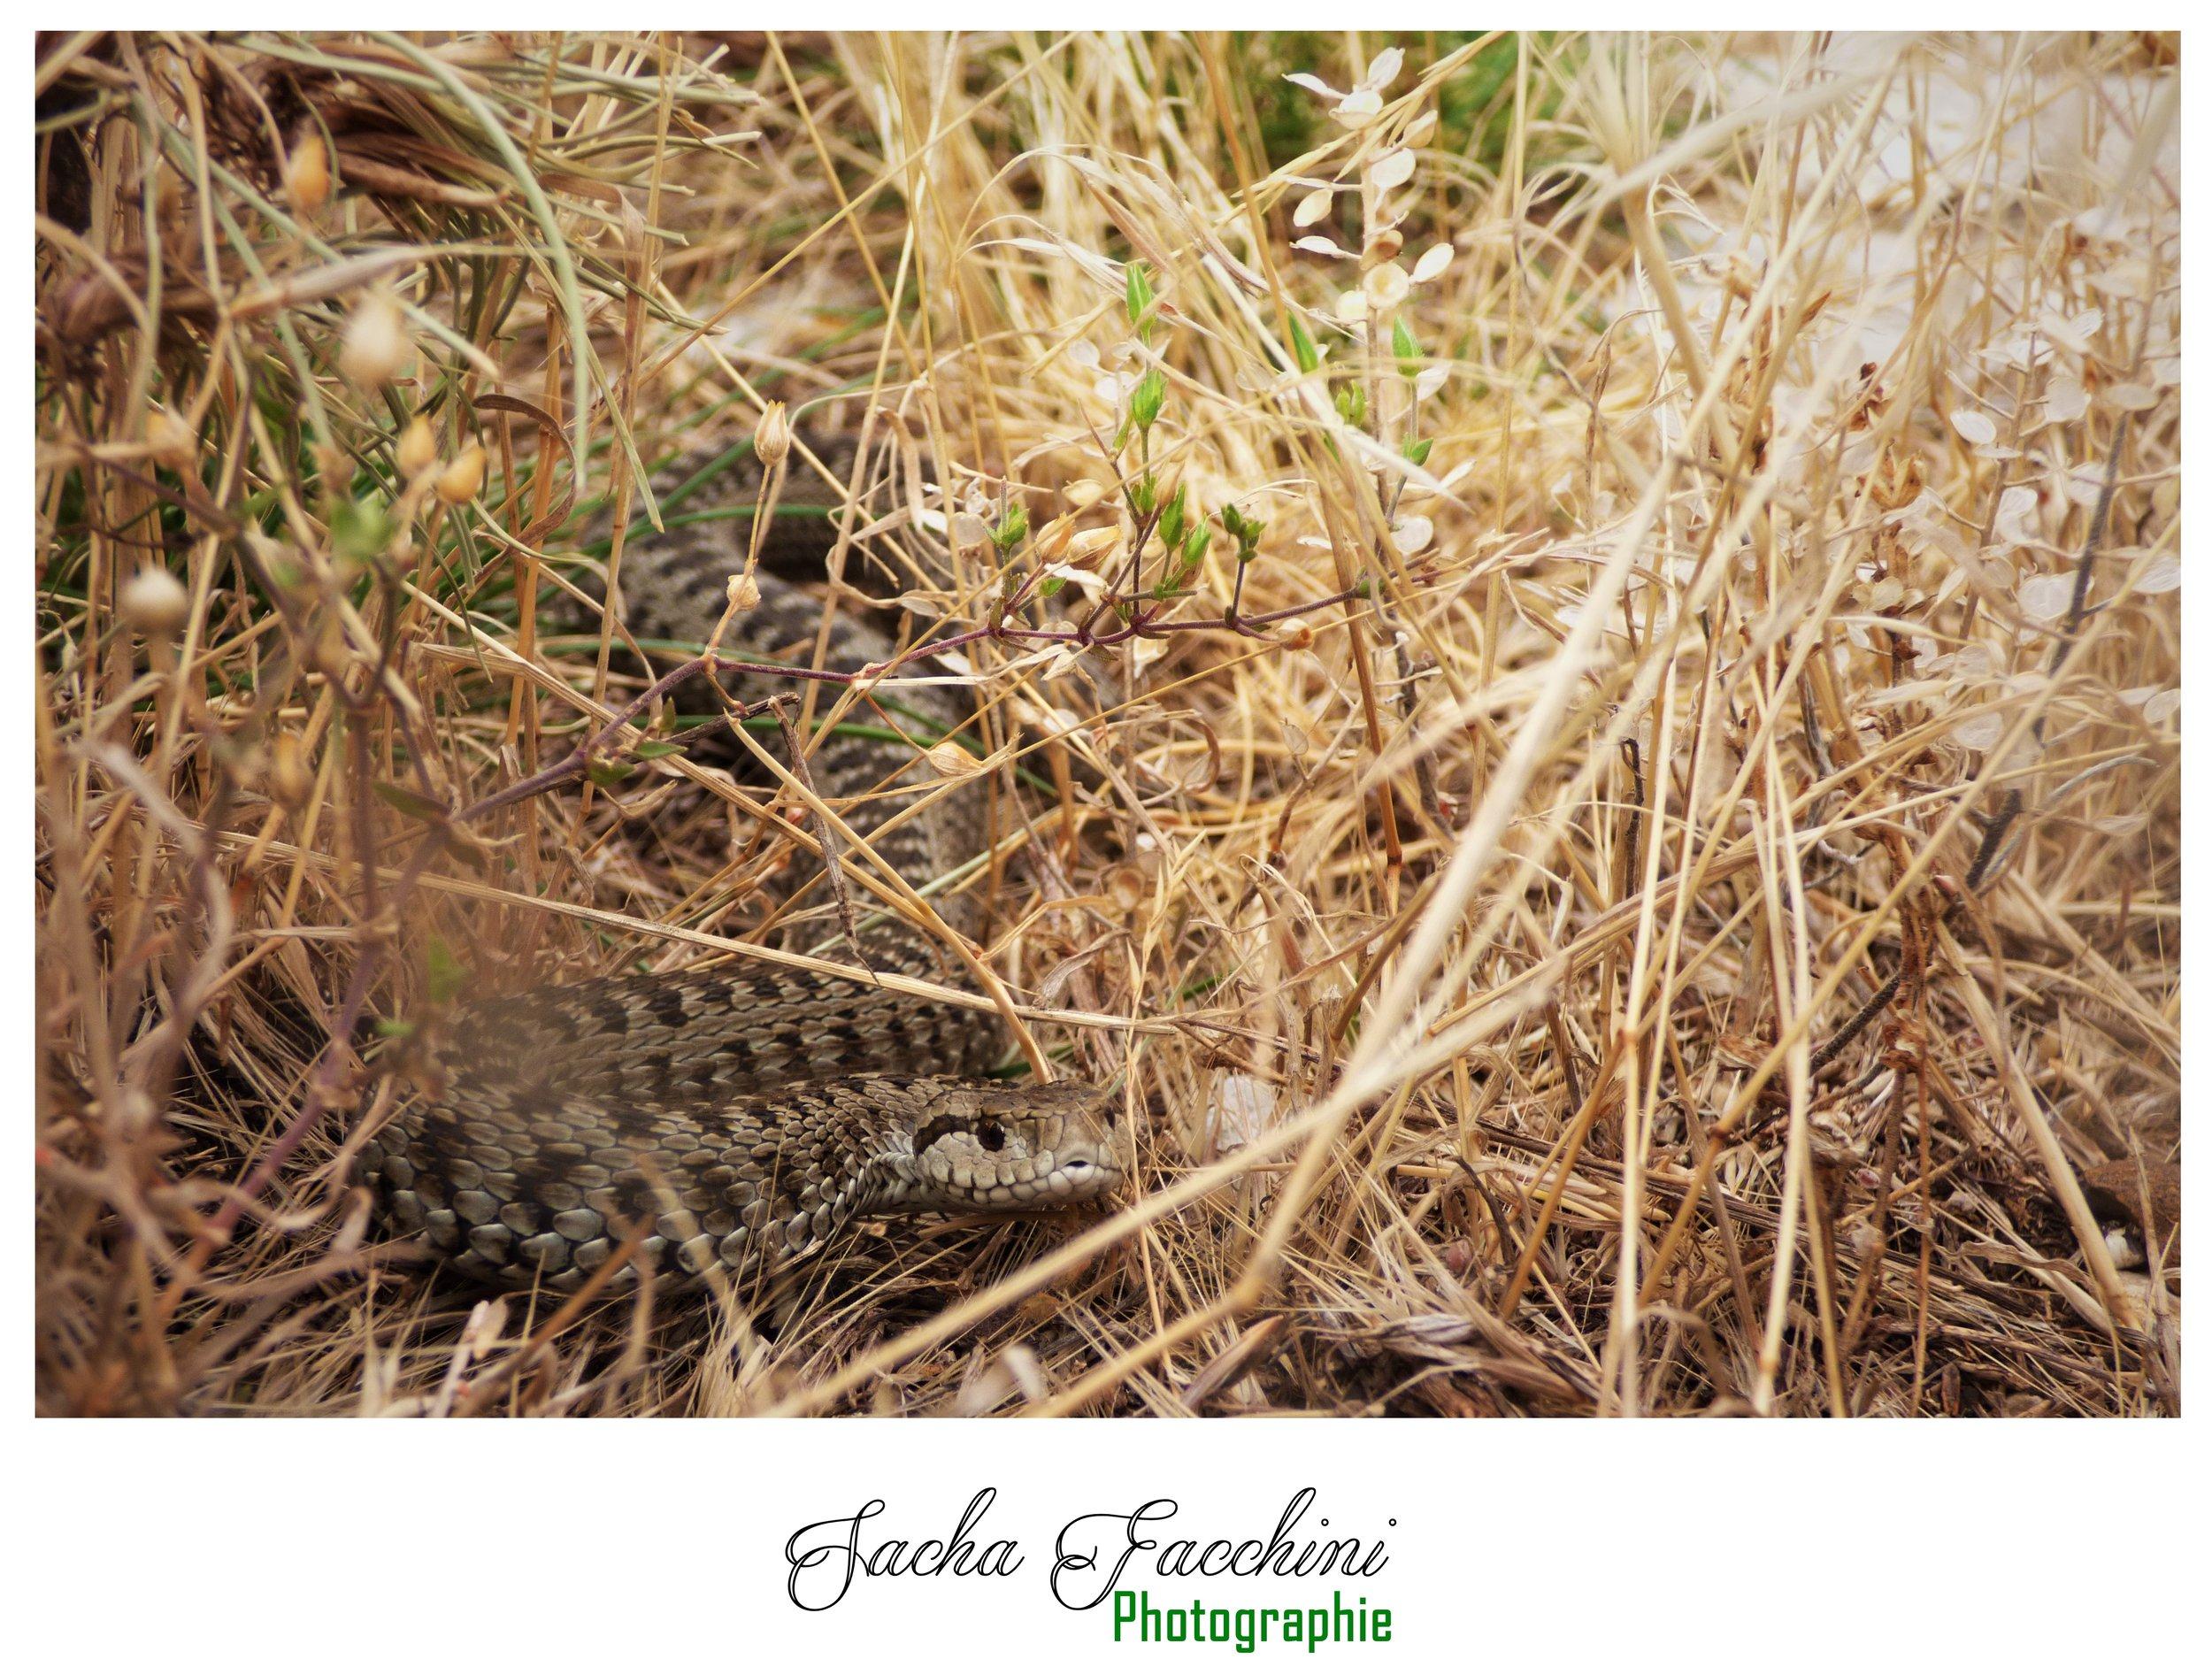 Adulte dans son habitat, Alpes-de-Haute-Provence (04) ©Sacha Facchini